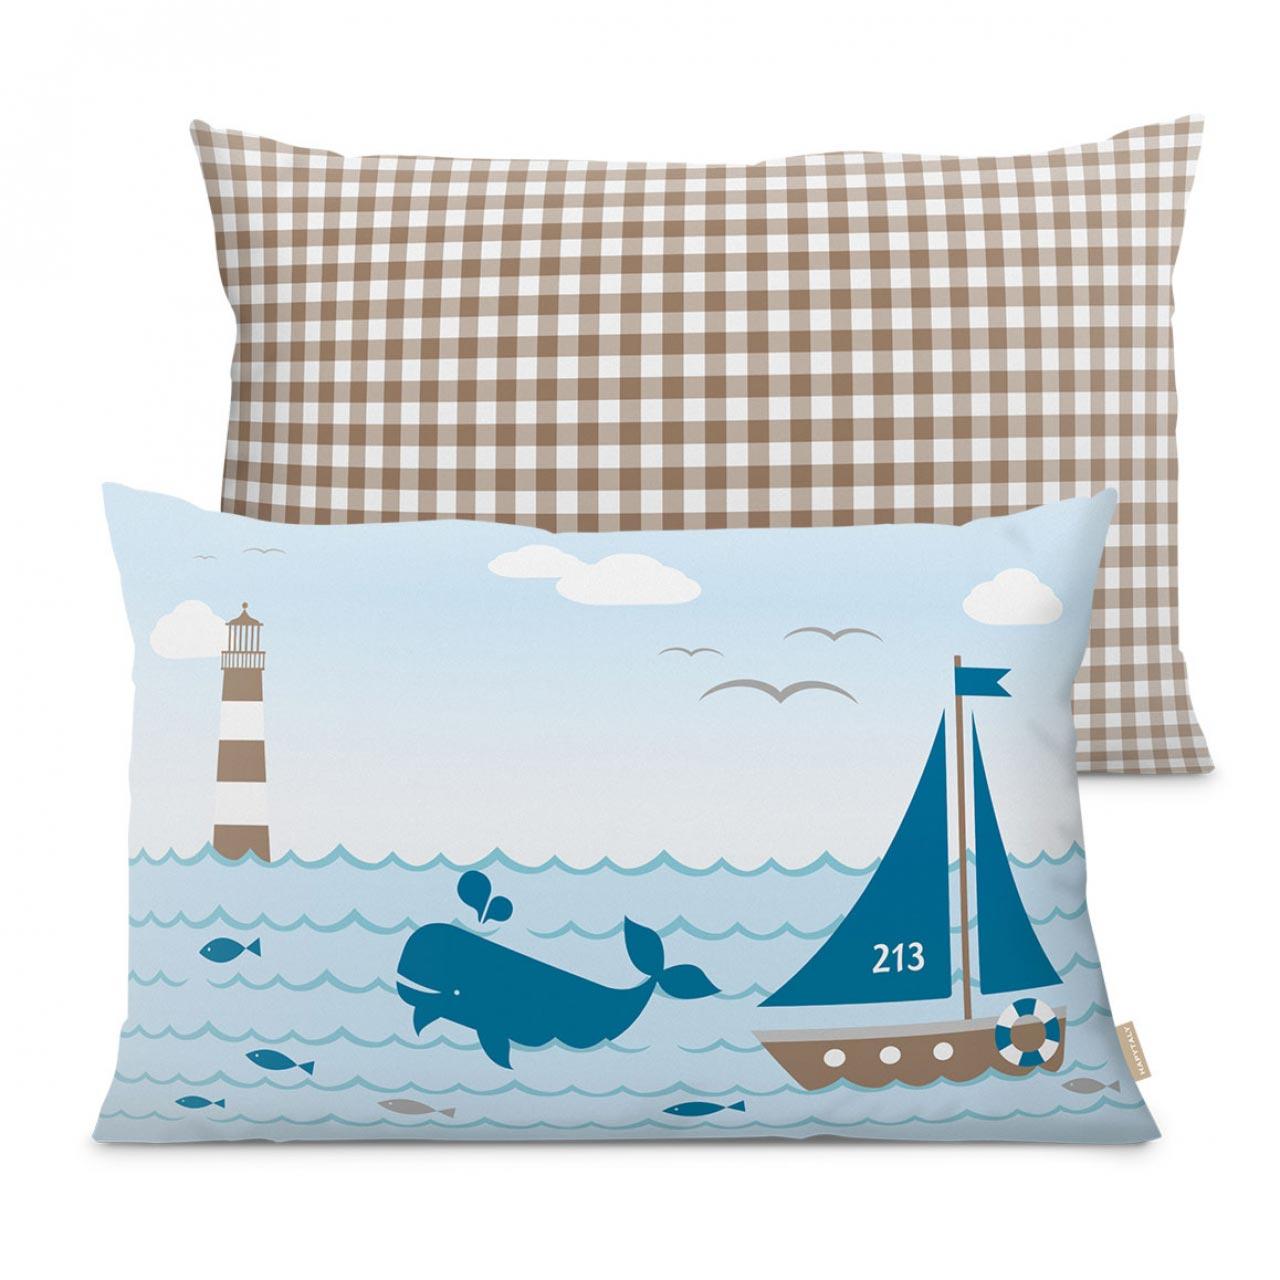 Kissen, maritimes Design mit Leuchtturm, Sailing Taupe 60 x 40 cm